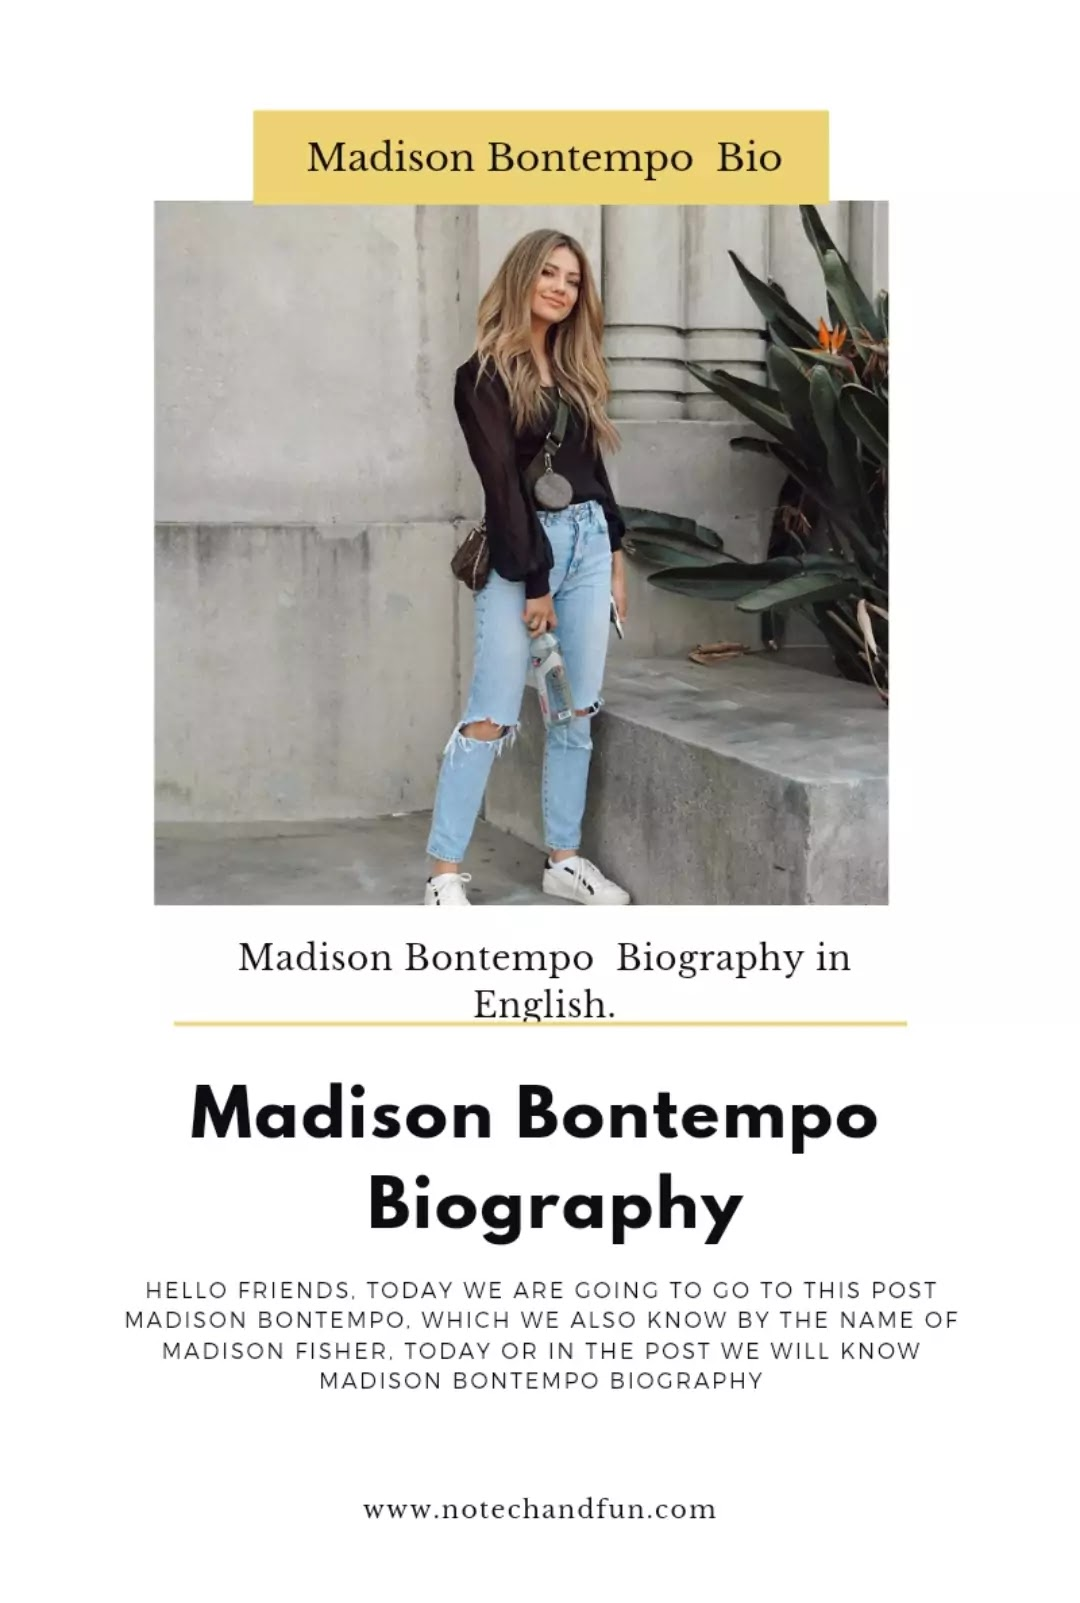 Madison Bontempo Biography